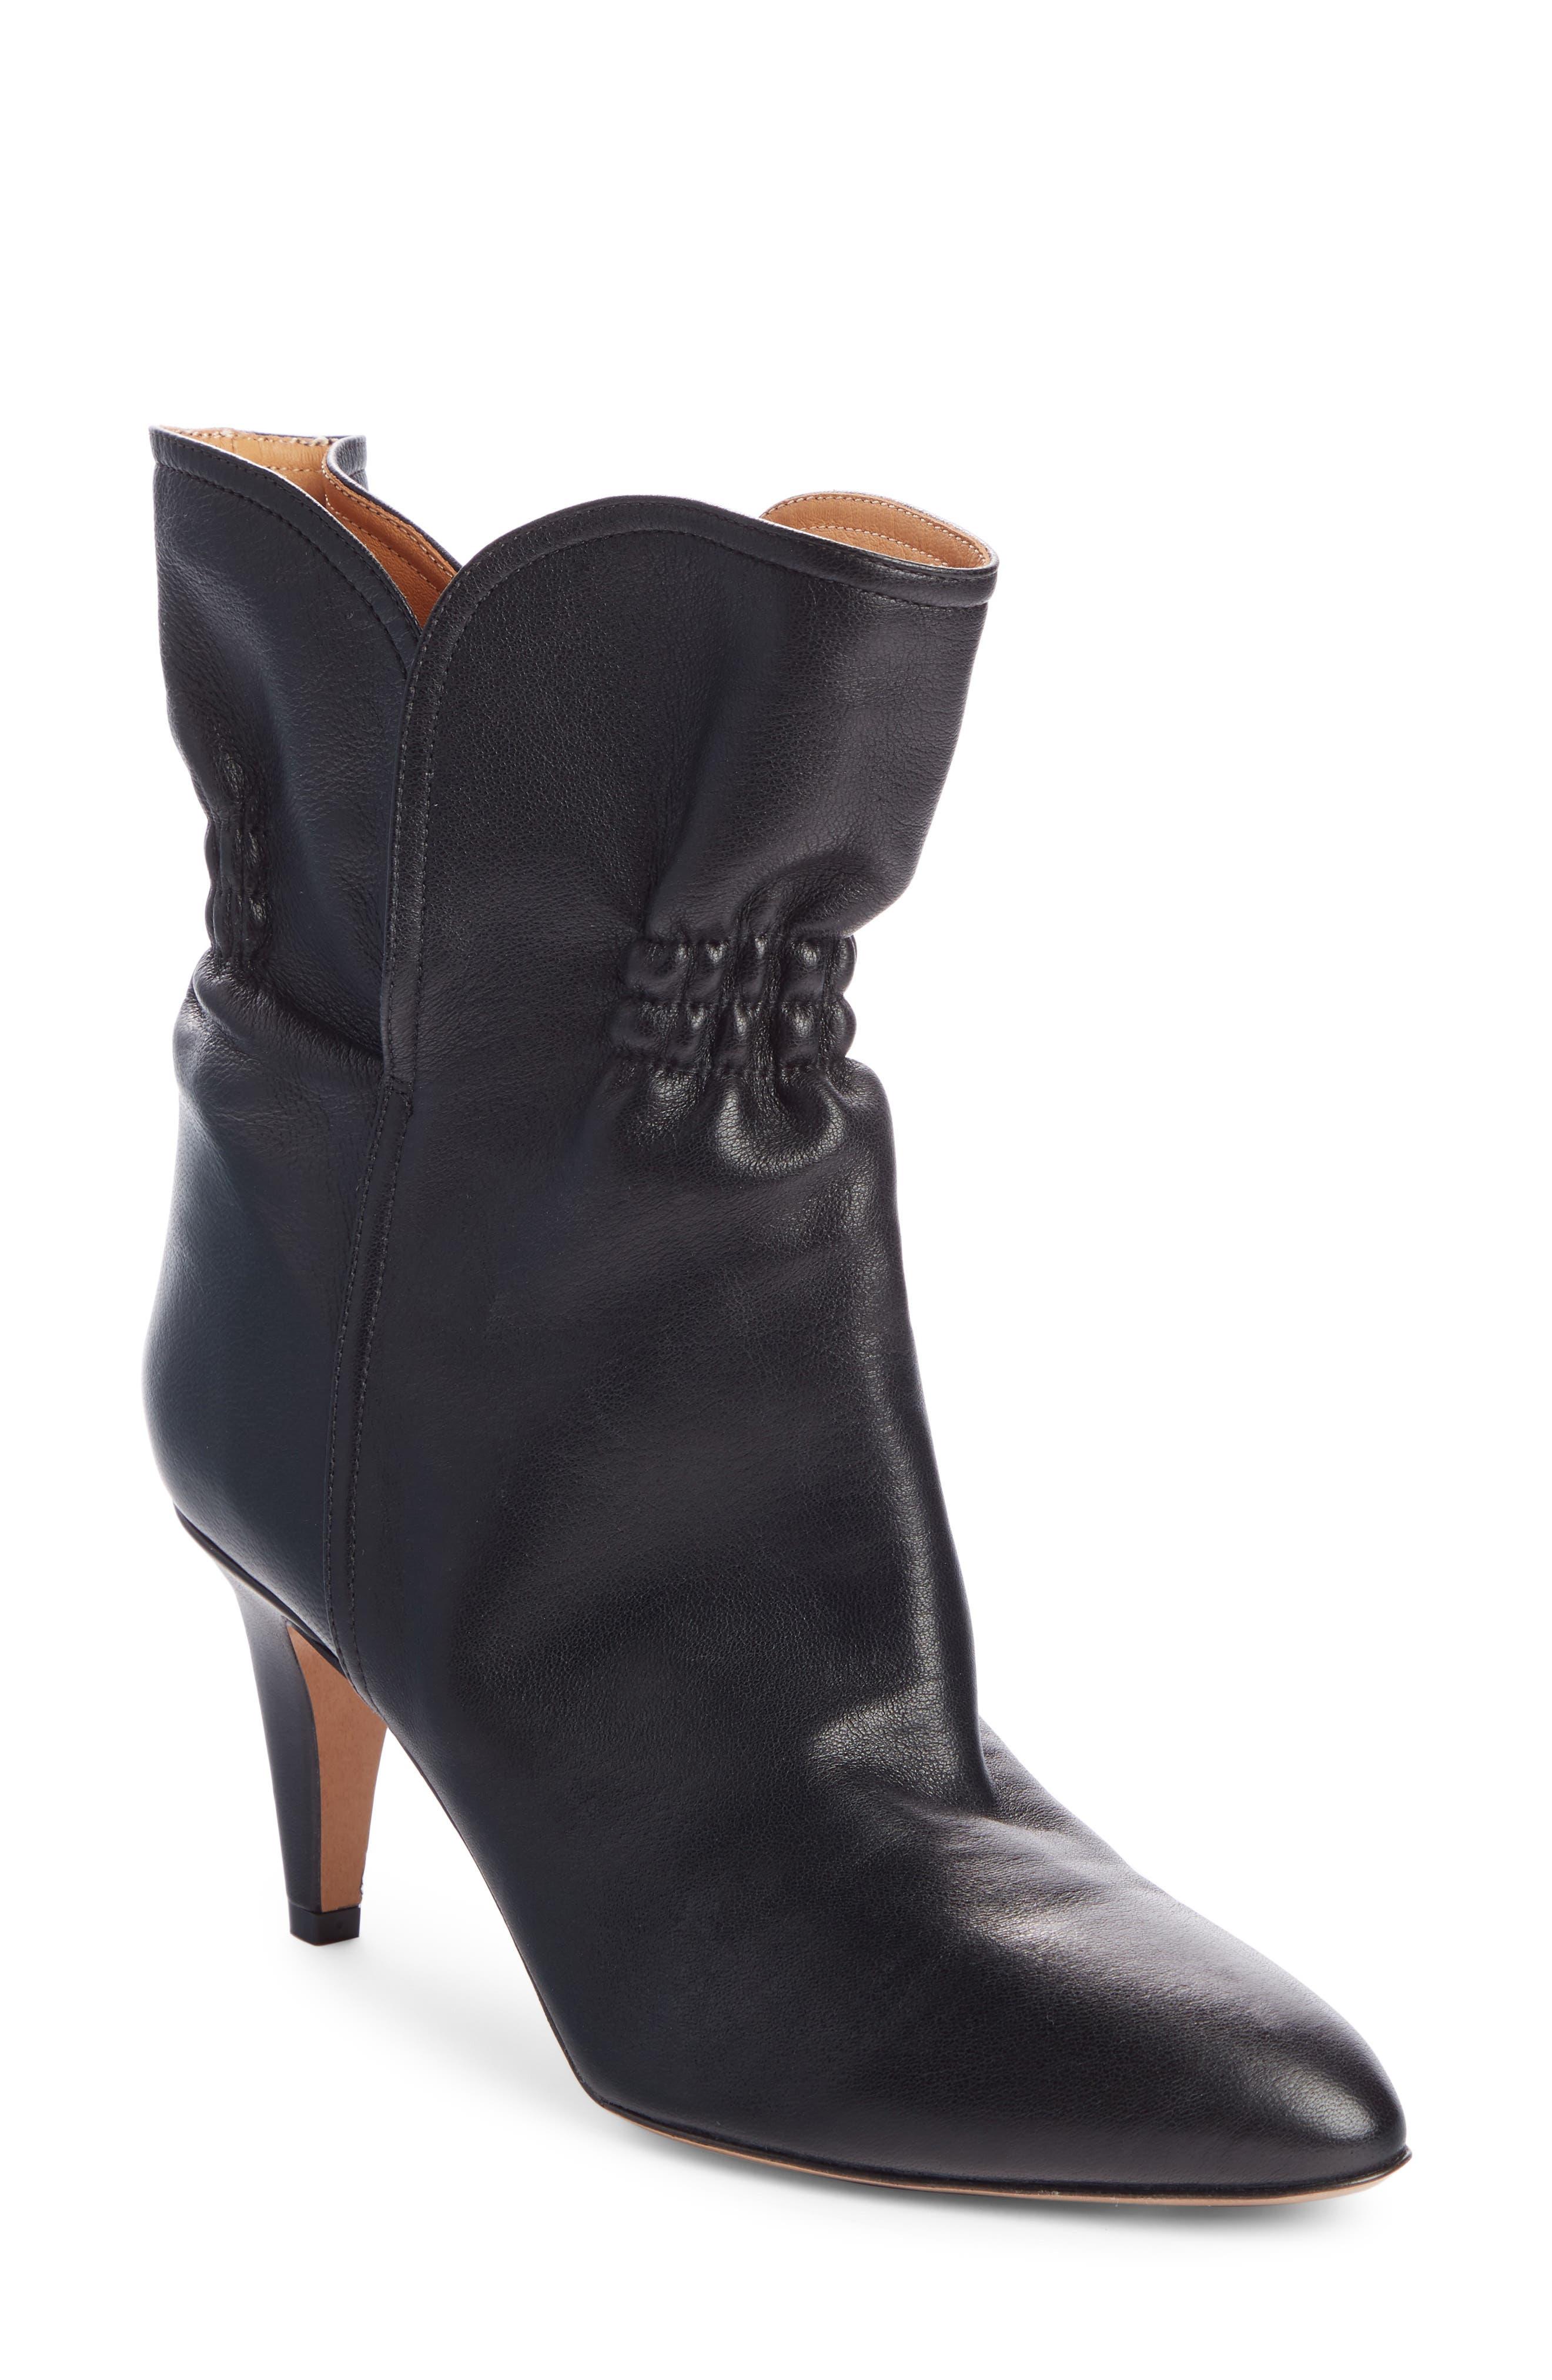 Isabel Marant Boots Dedie Cinched Bootie